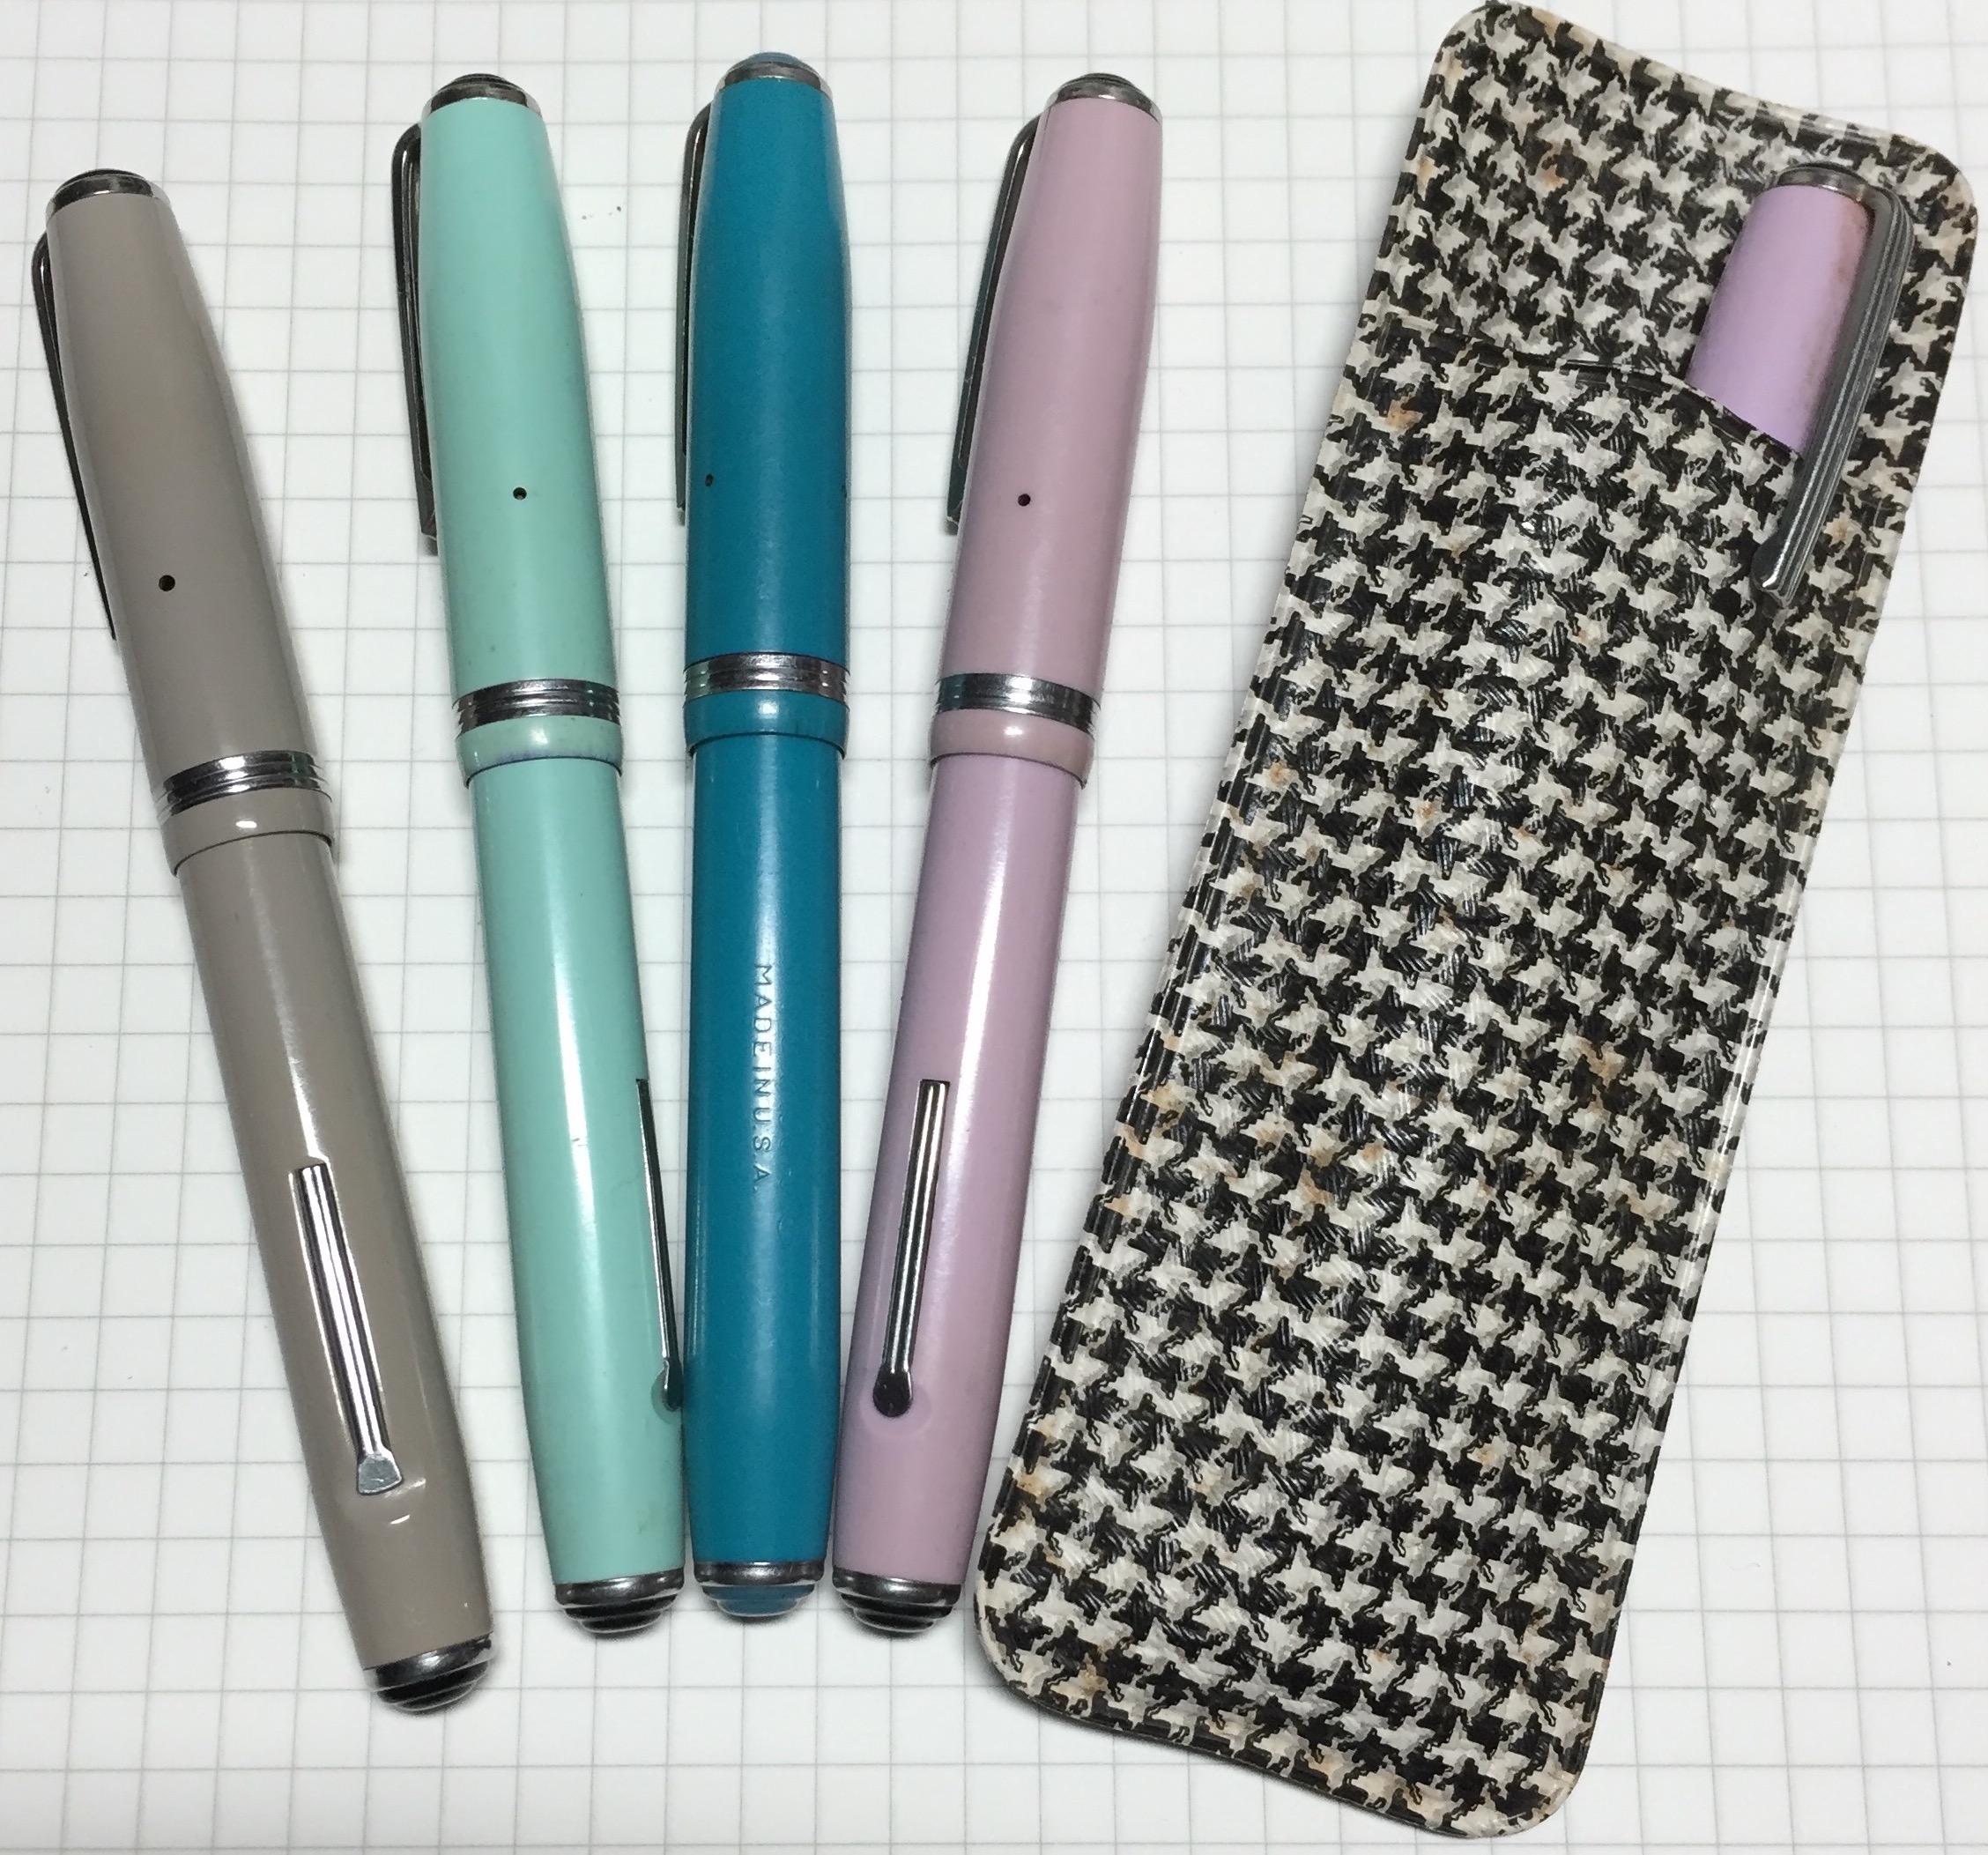 A selection of Esterbrook purse pens